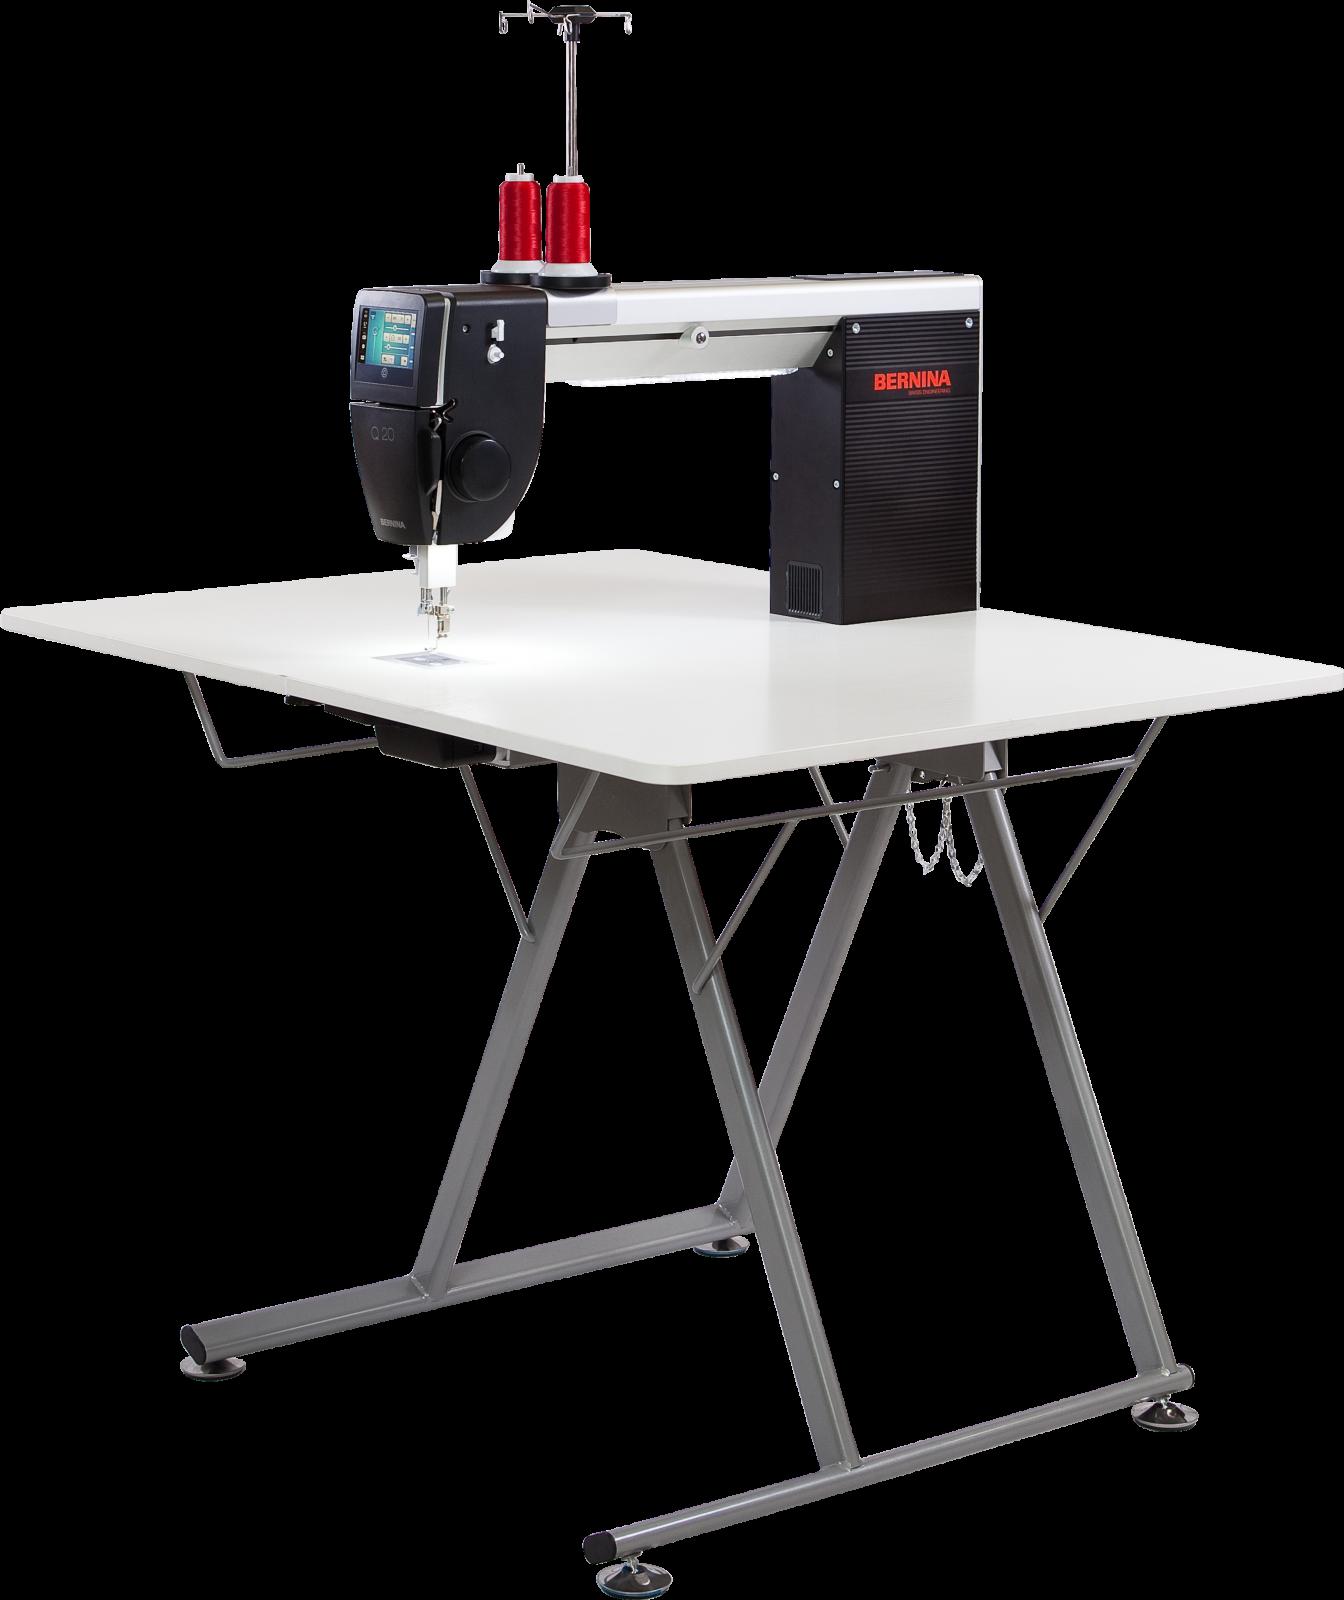 Bernina Q20 with Folding Table